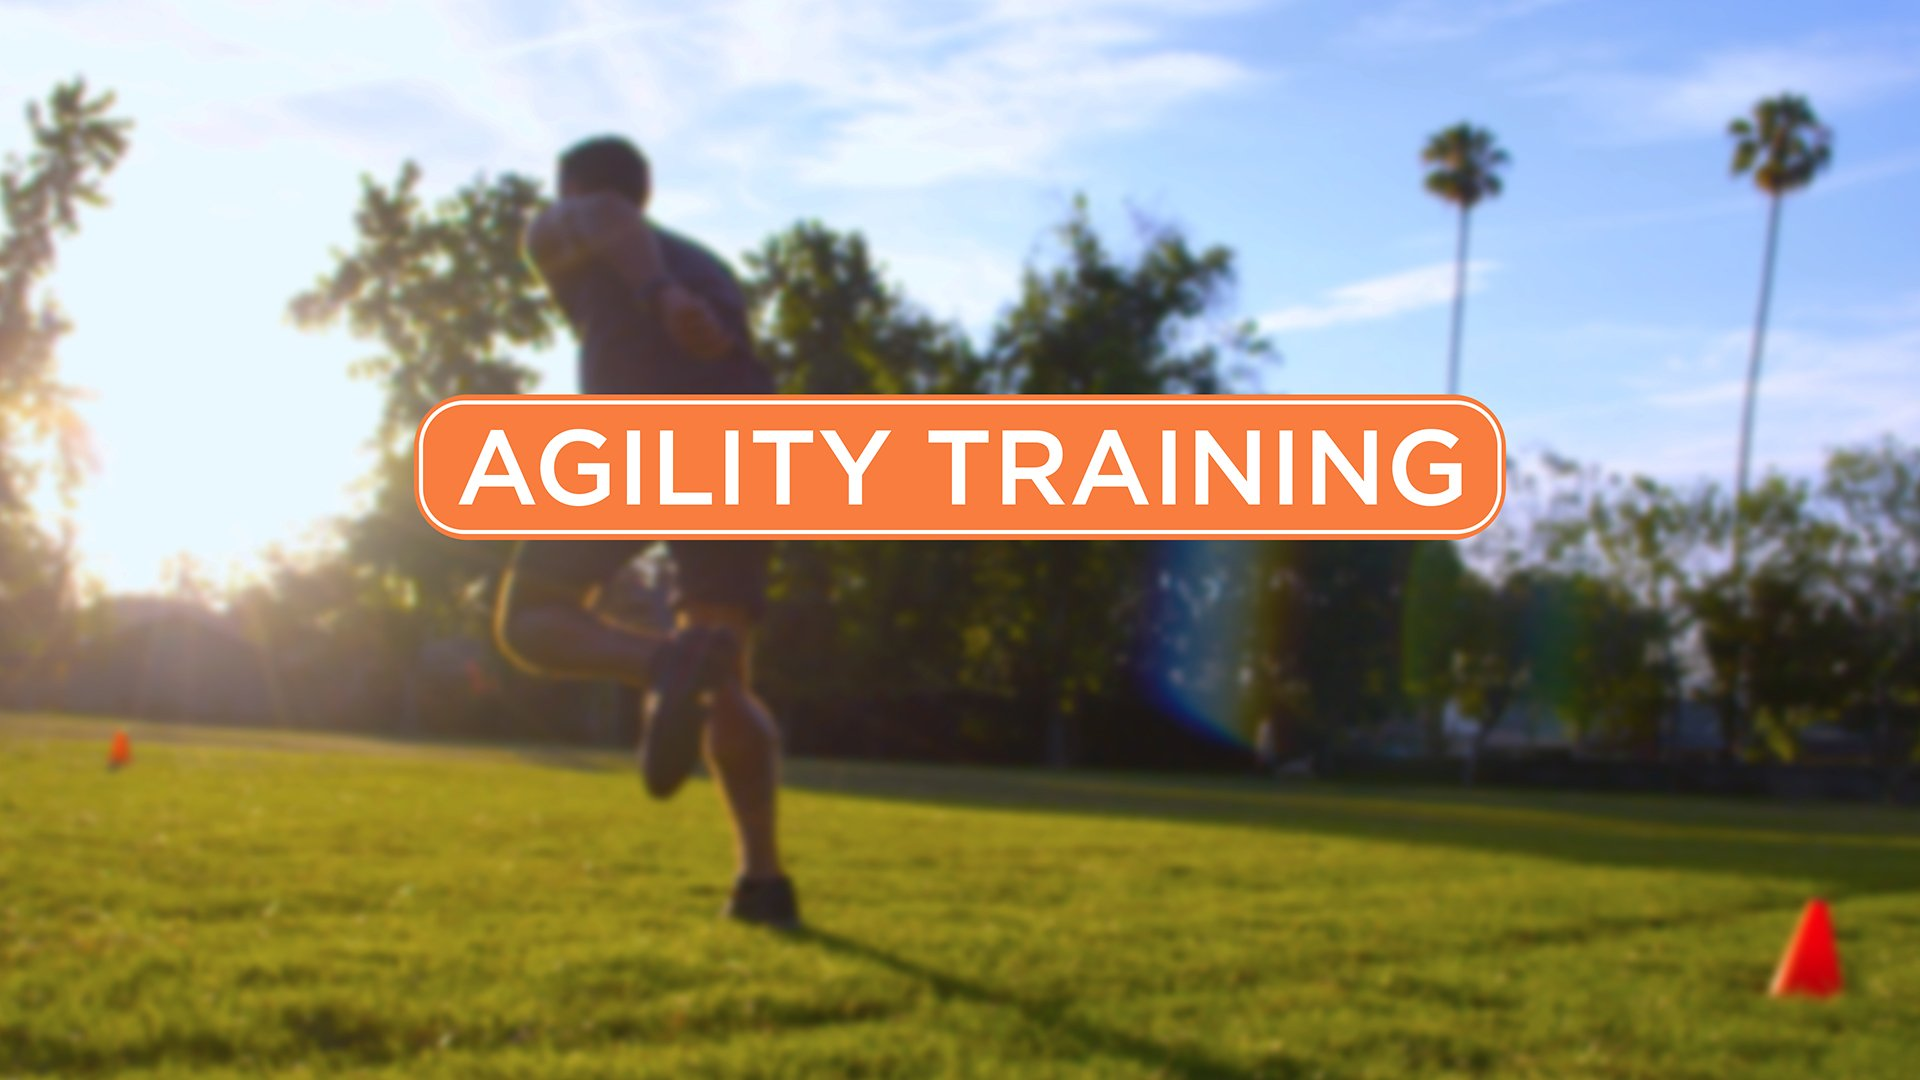 4 week Agility training program